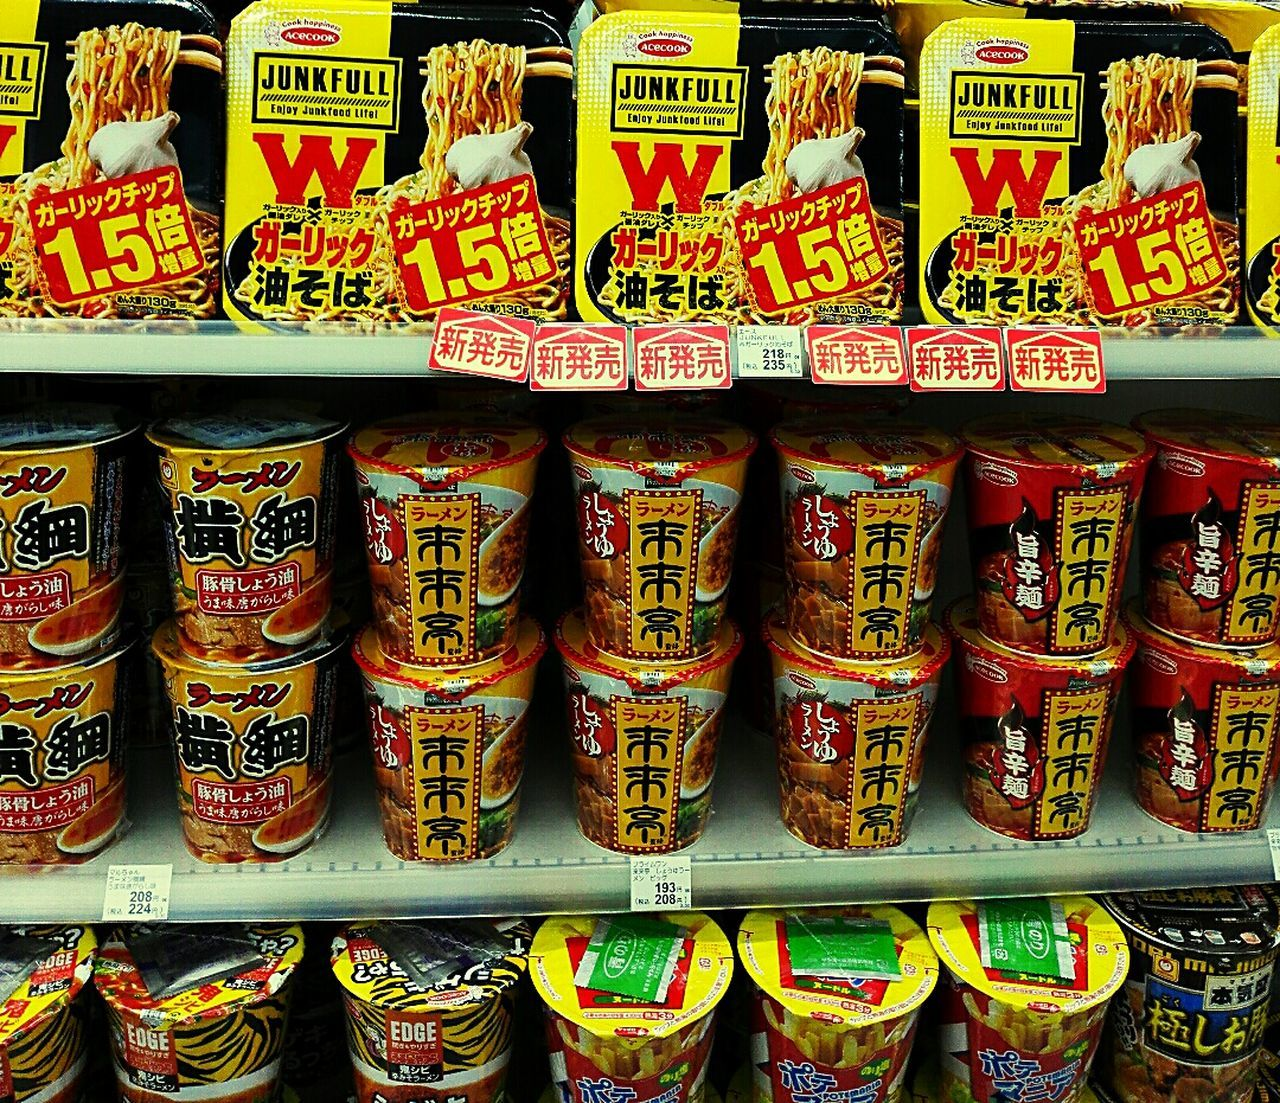 Junk Food Japan Photography Japanese Food Japanese Style Convenience Store Convenience Food コンビニ コンビニエンスストア大阪 Noodles Ramen Cup Noodles  カップヌードル